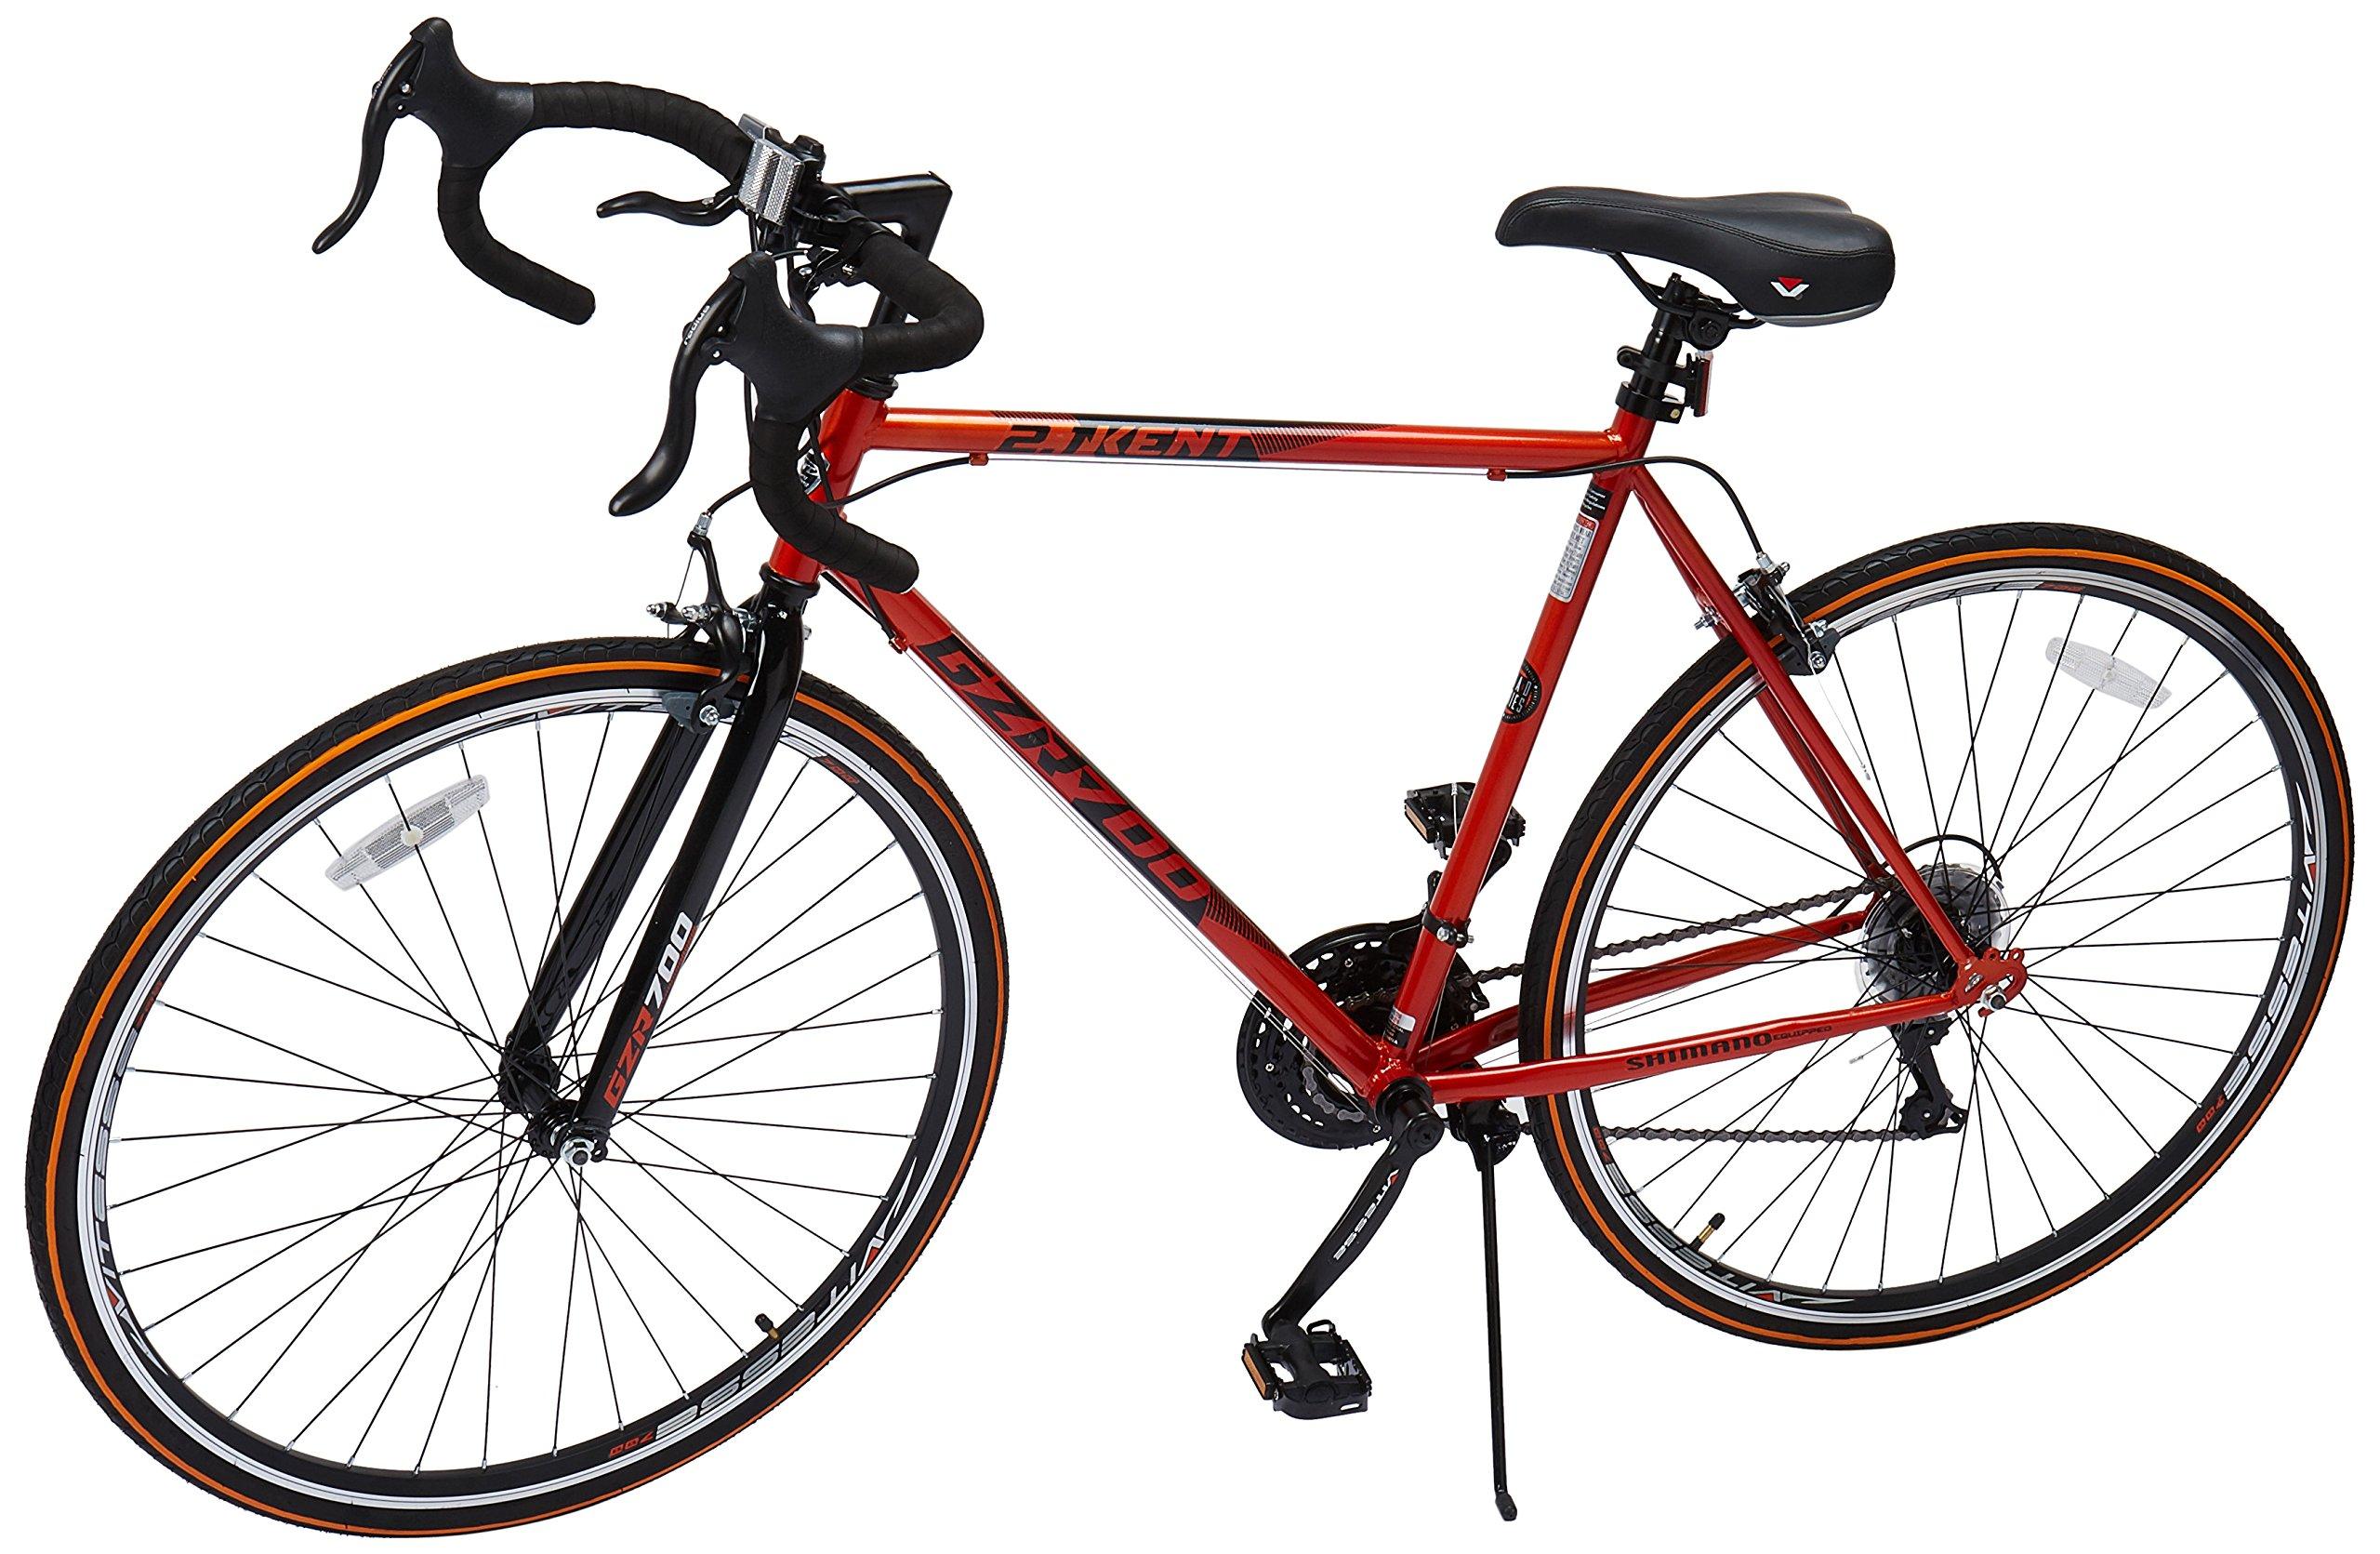 Kent GZR700 Road Bike